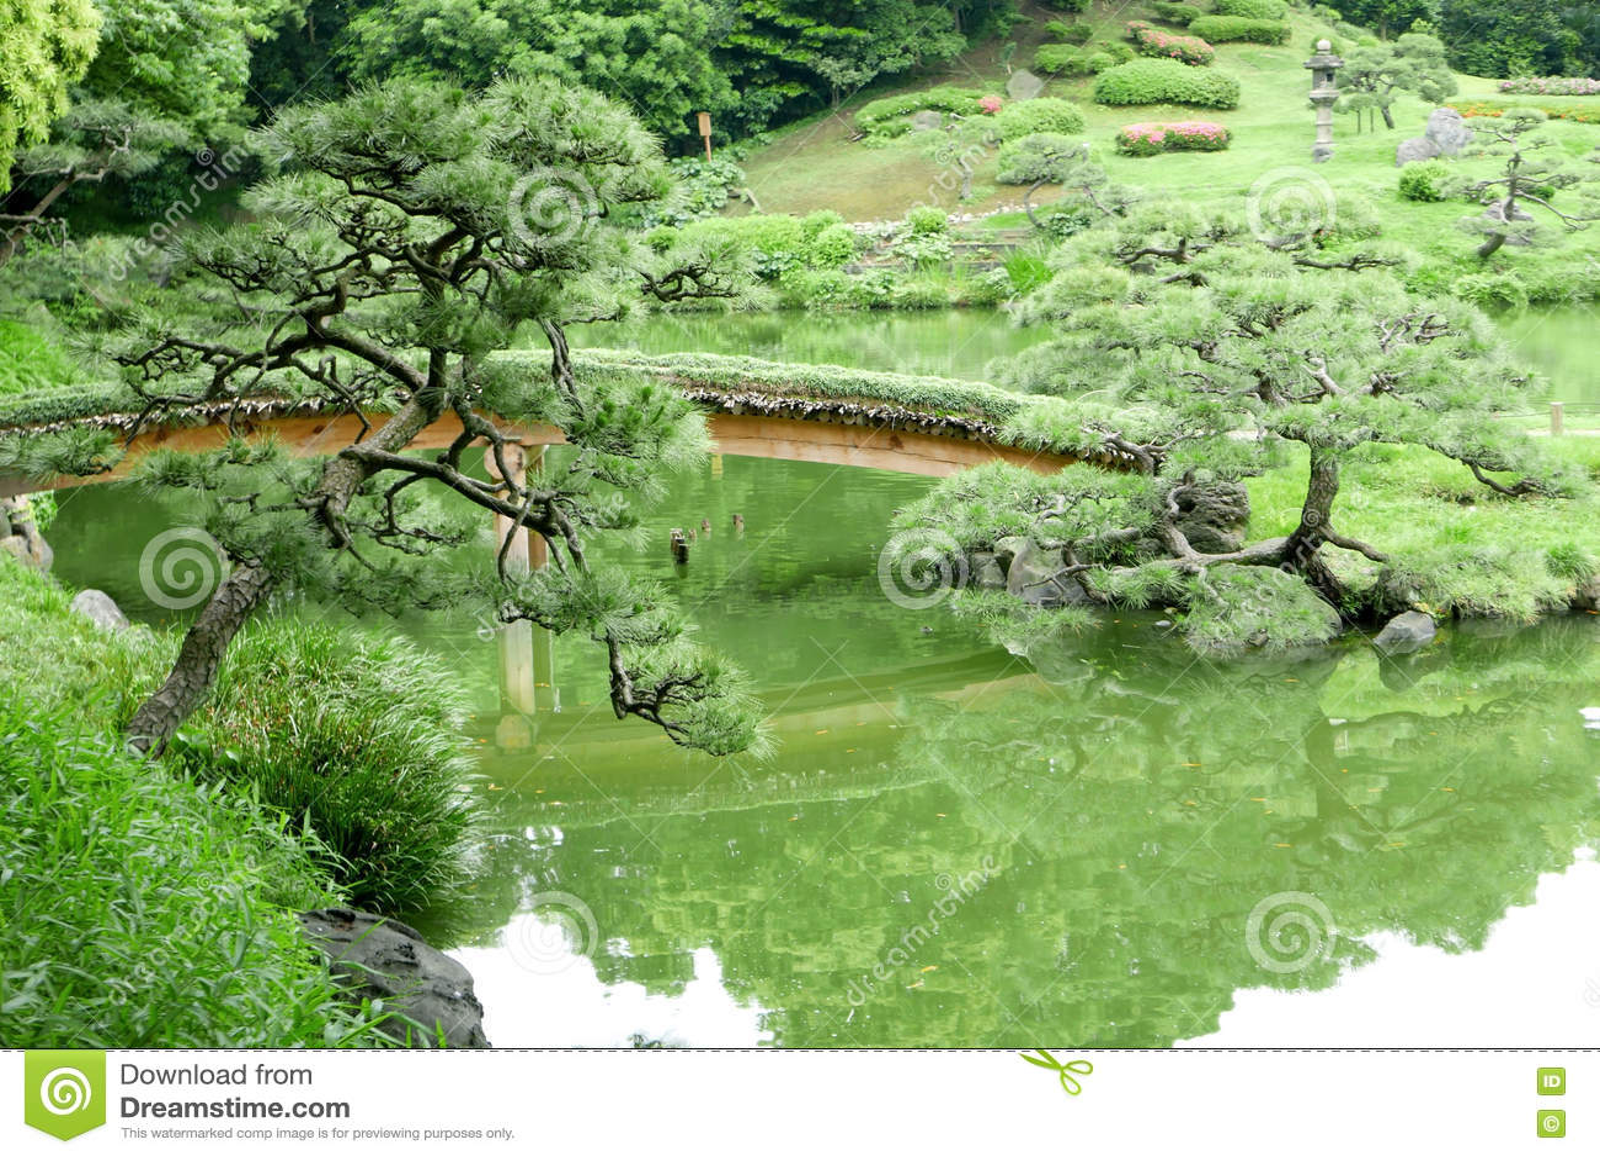 colina verde puente lago en jardn japons del zen foto de archivo